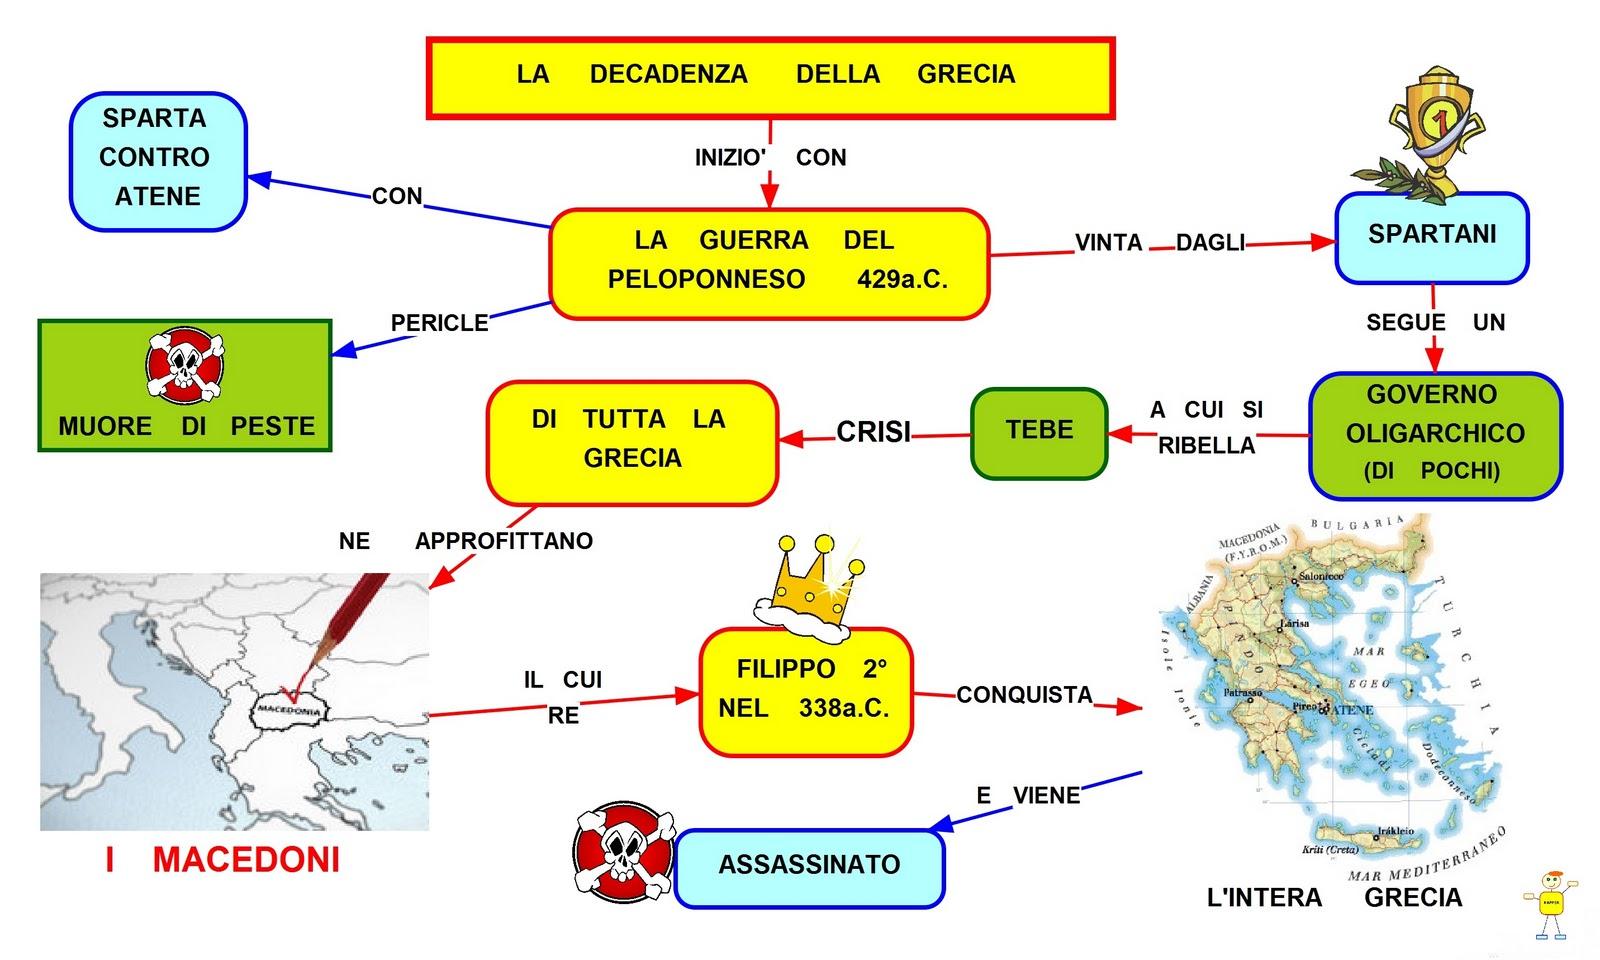 Mappa Concettuale Macedoni Scuolissimacom